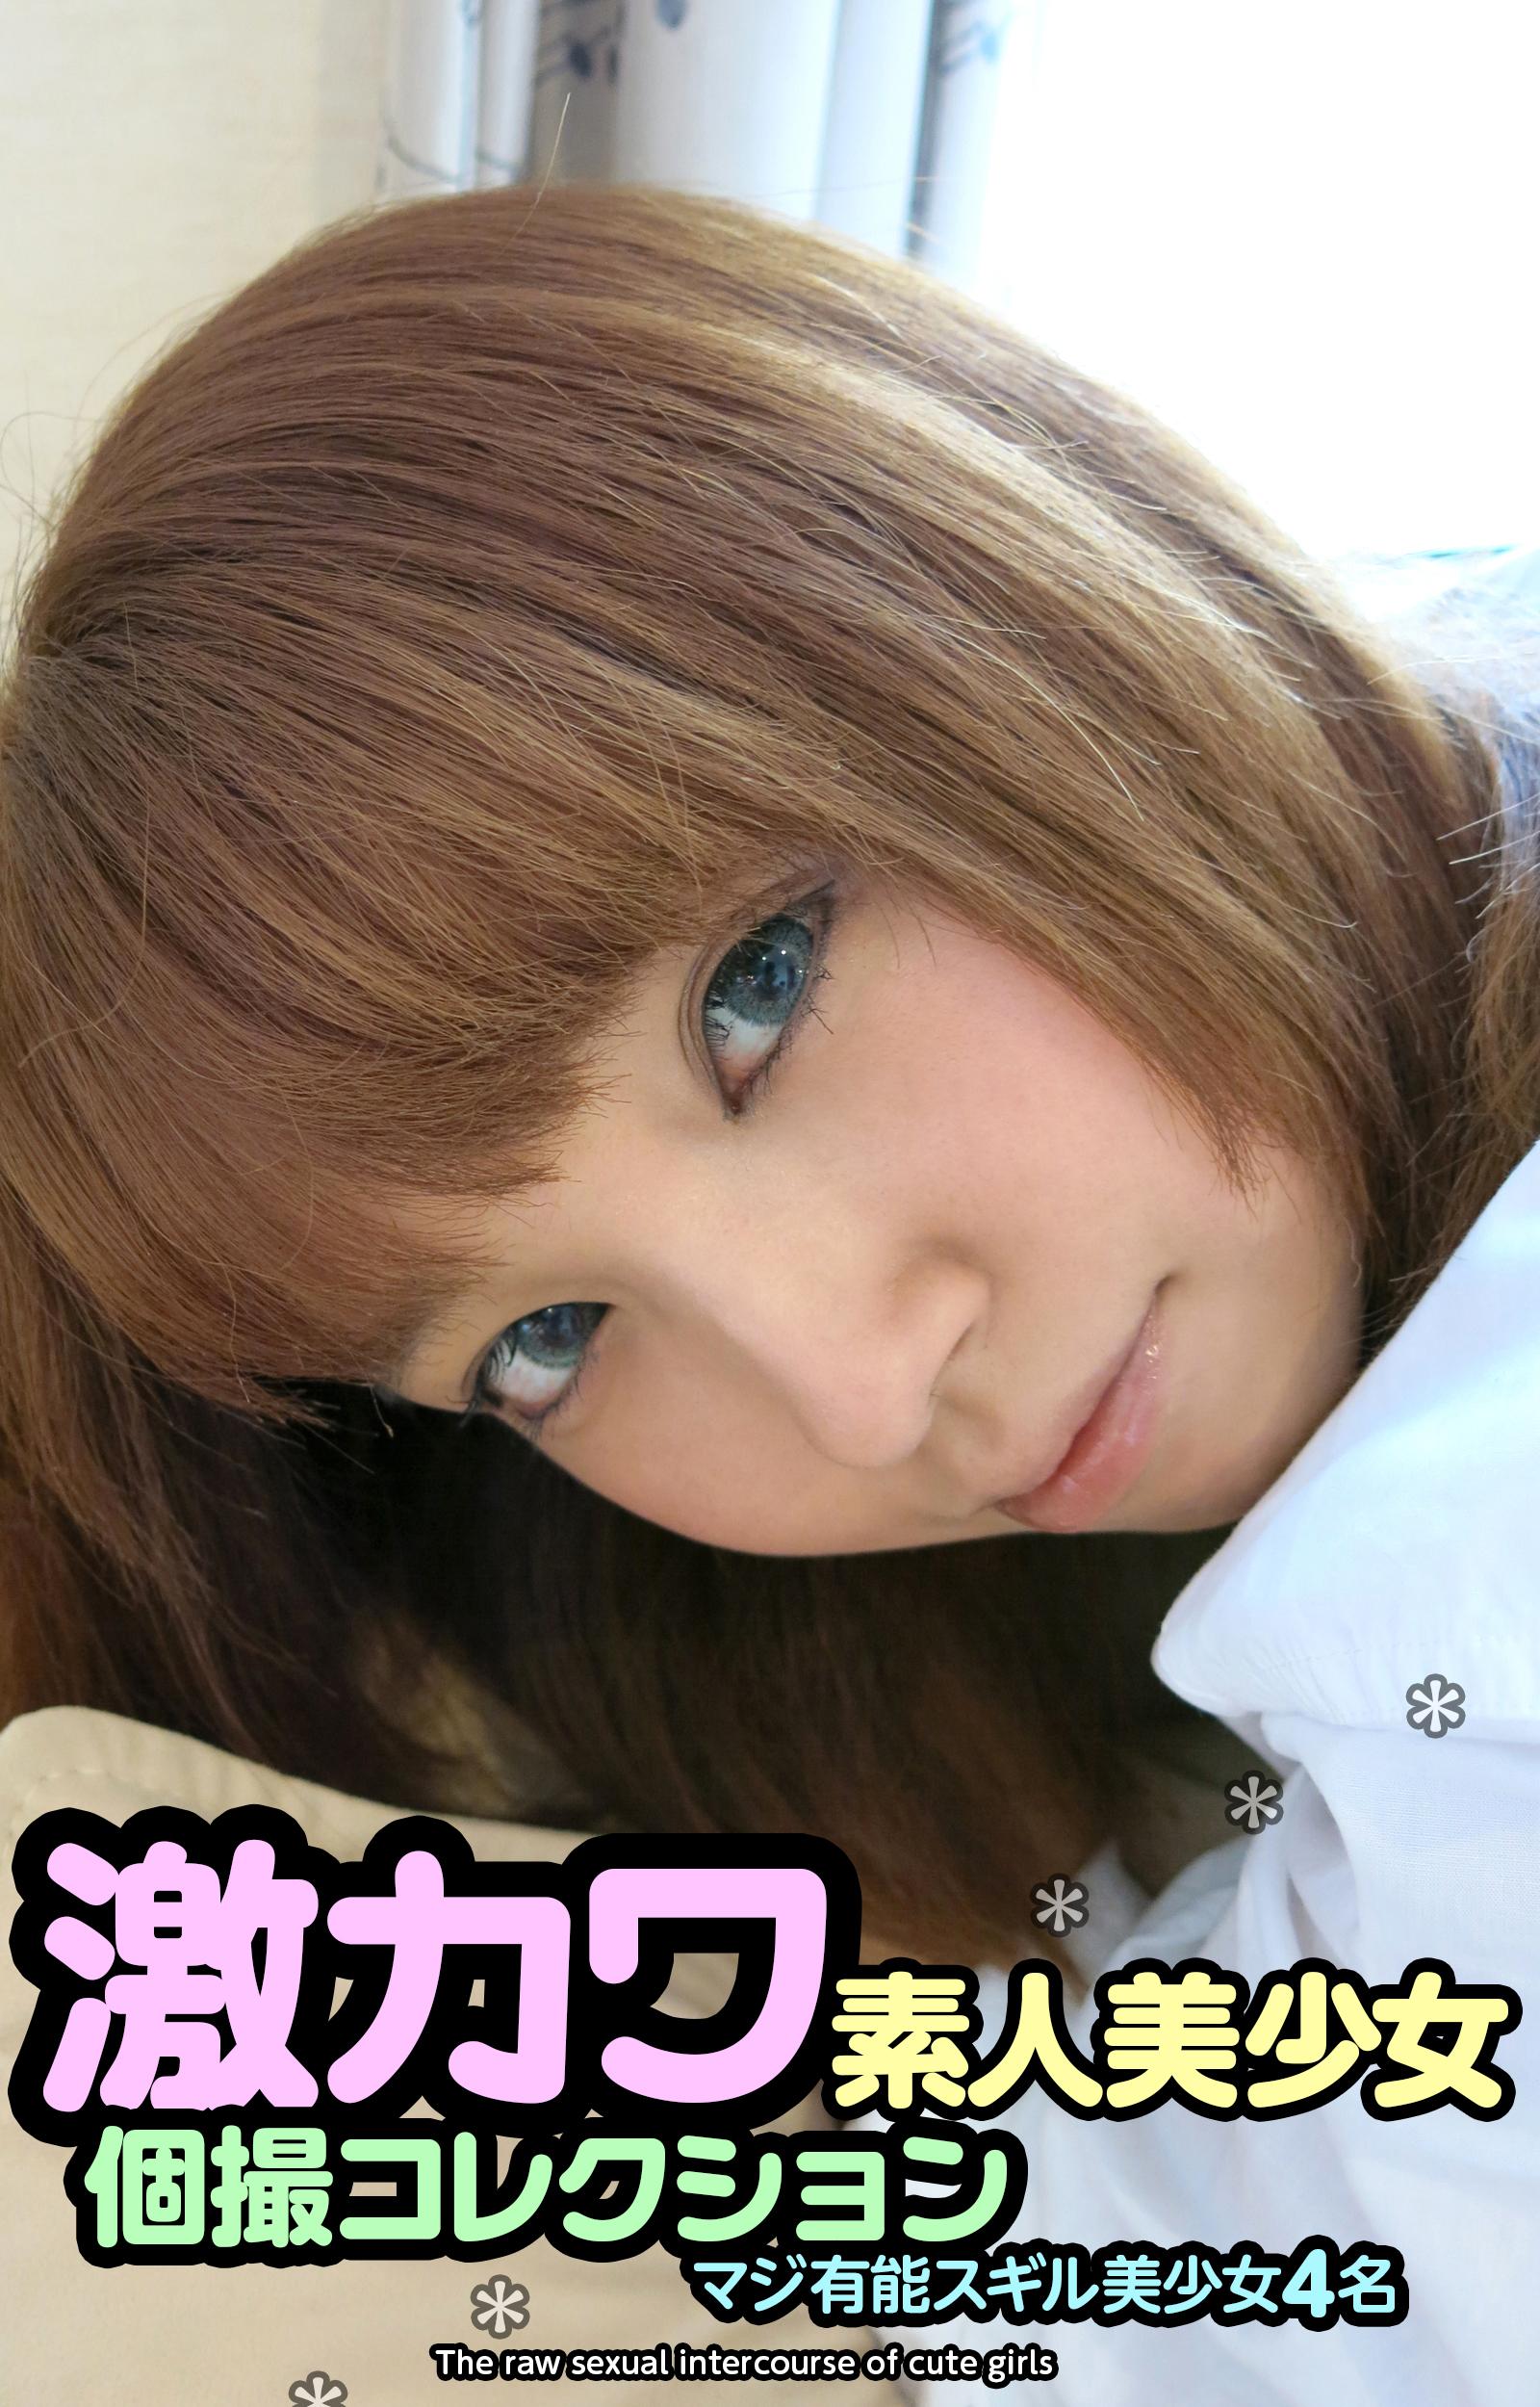 ★ZIP付き★激カワ素人美少女 個撮コレクション マジ有能スギル美少女4名